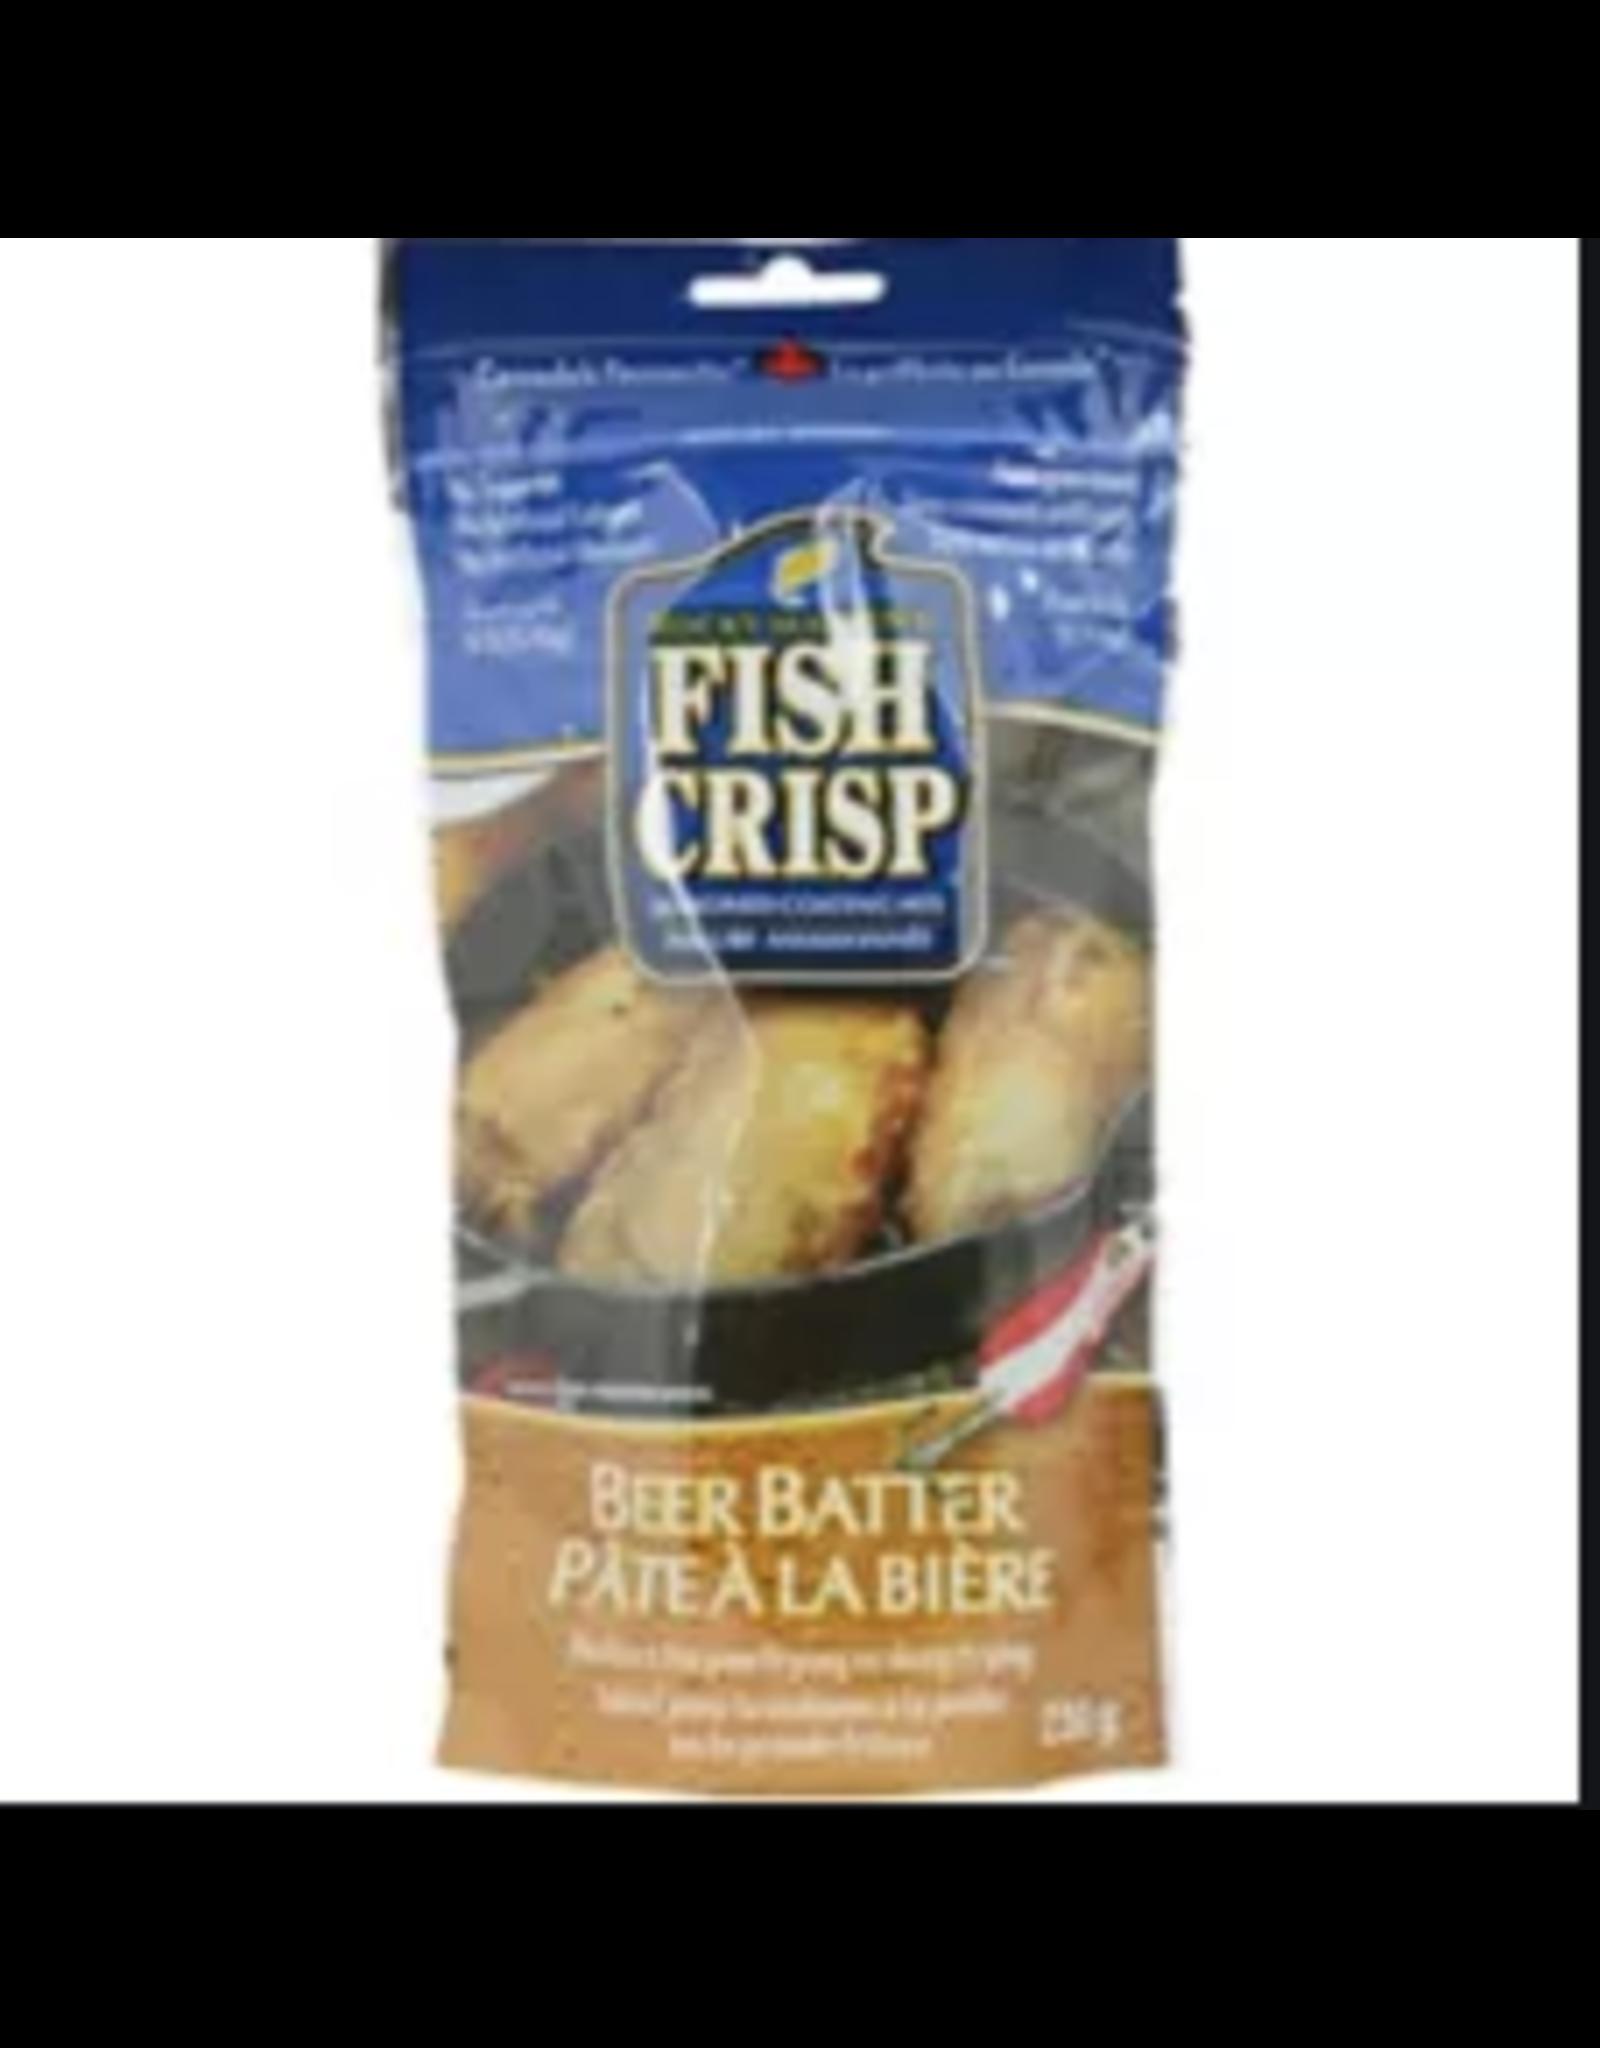 Fish Crisp Fish Crisp Beer Batter